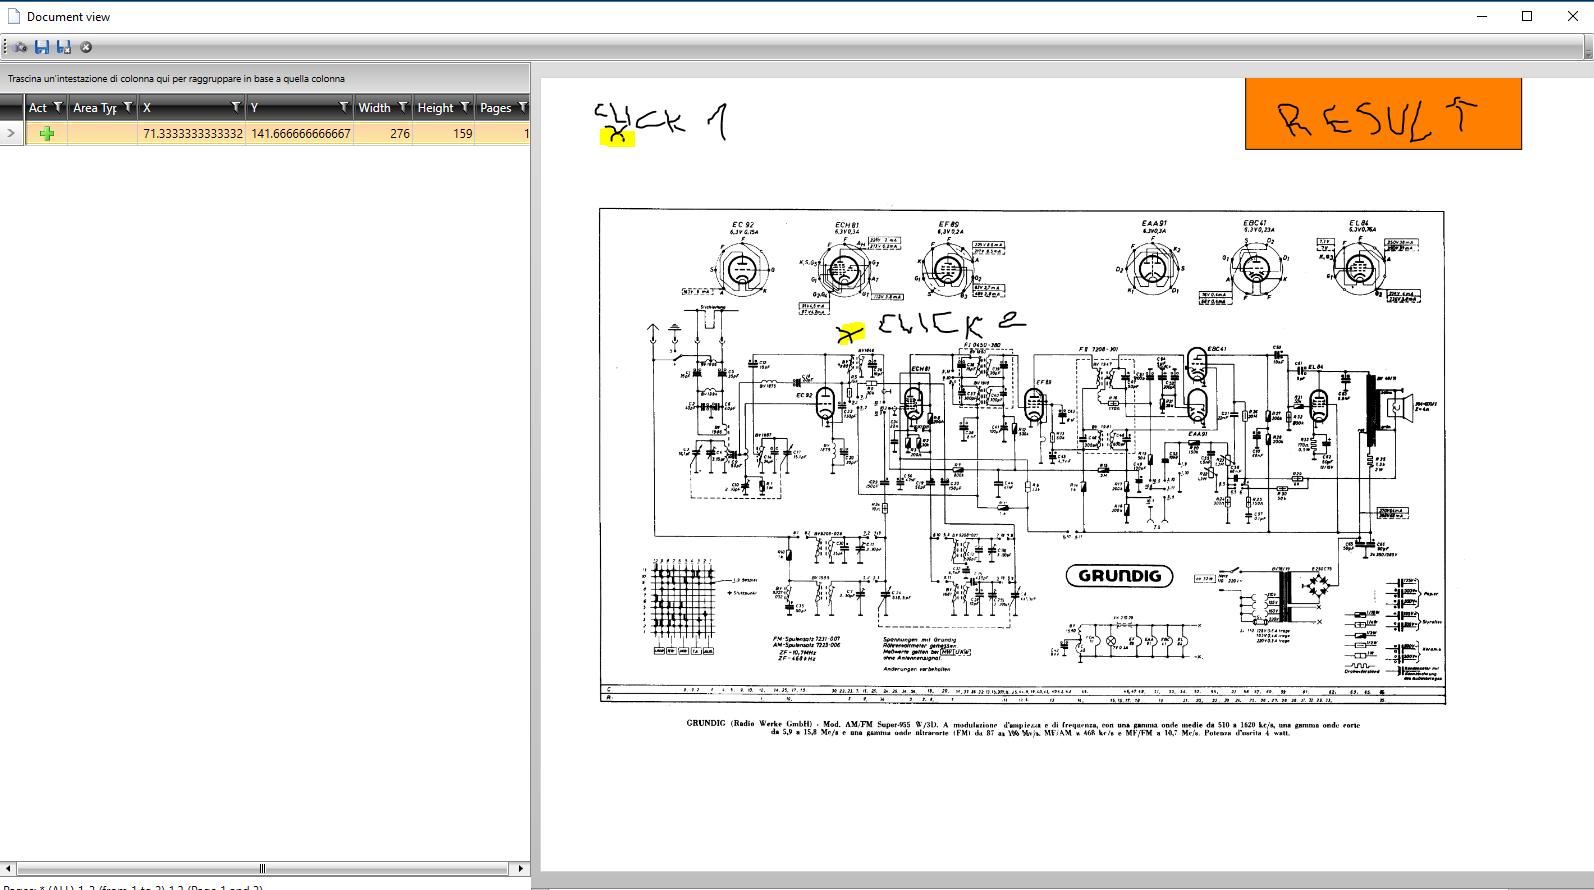 Area selecion coordinate in UI for WPF PDFViewer - Telerik